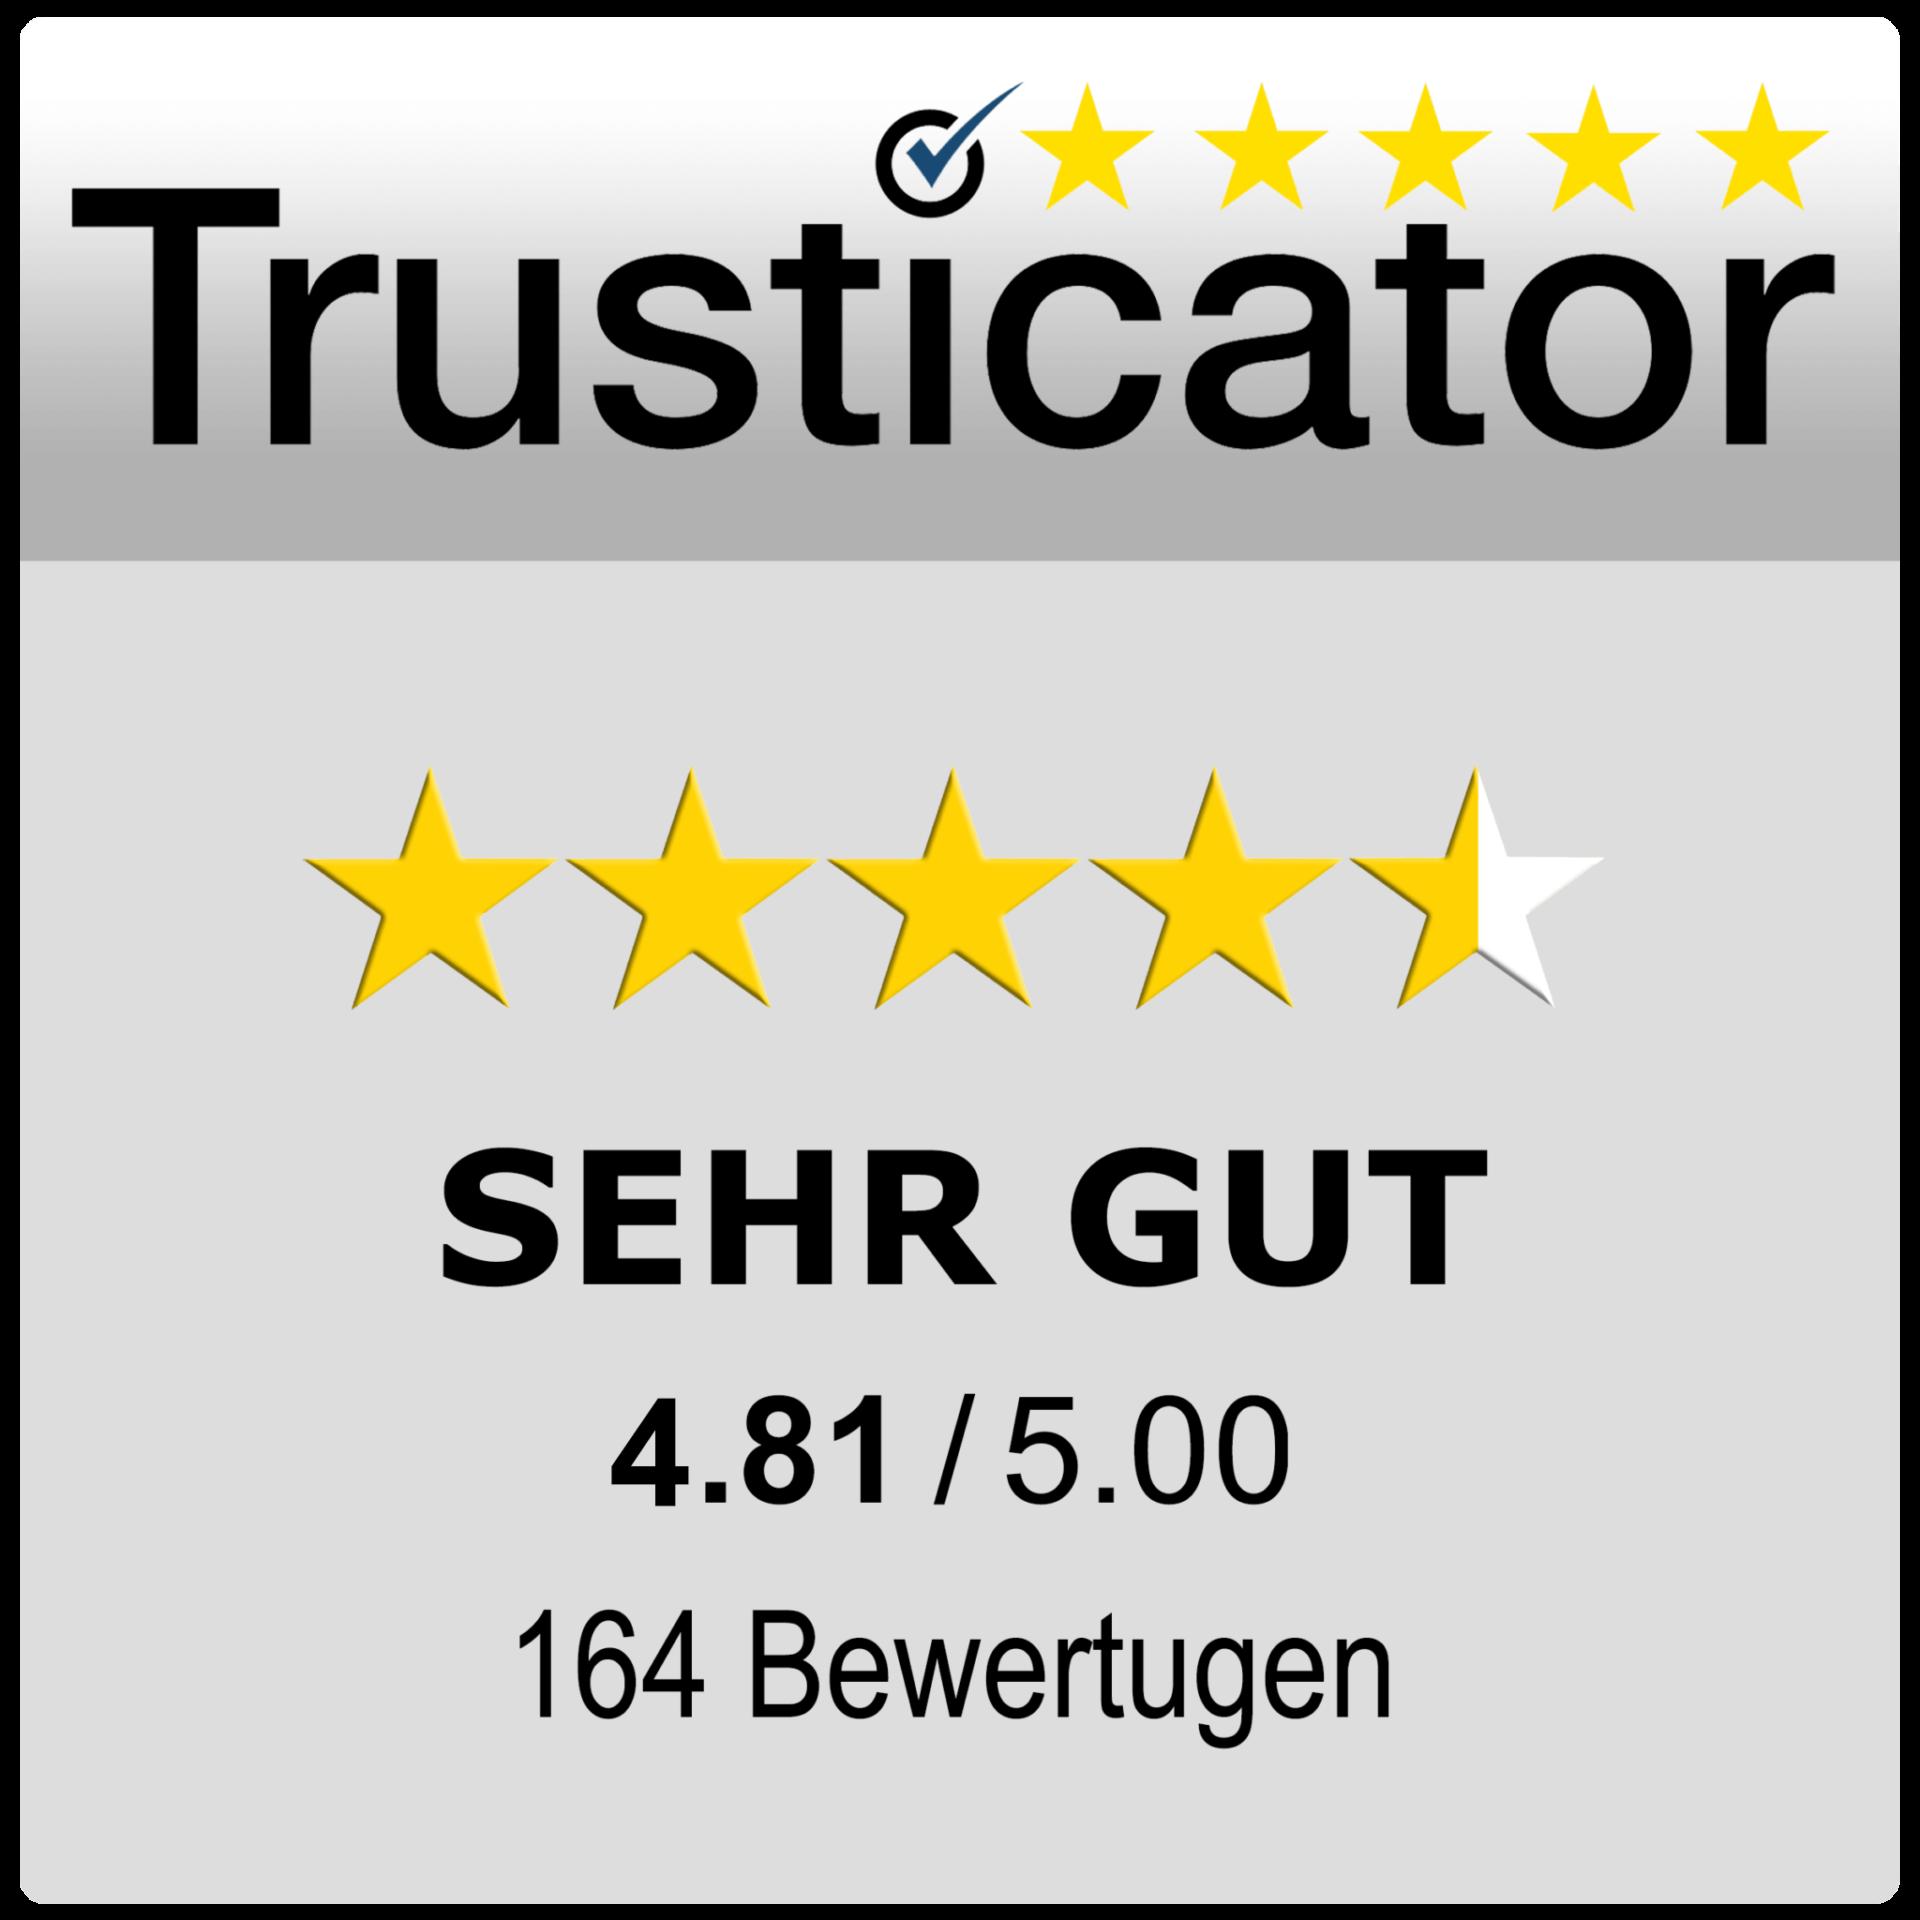 Trusticator